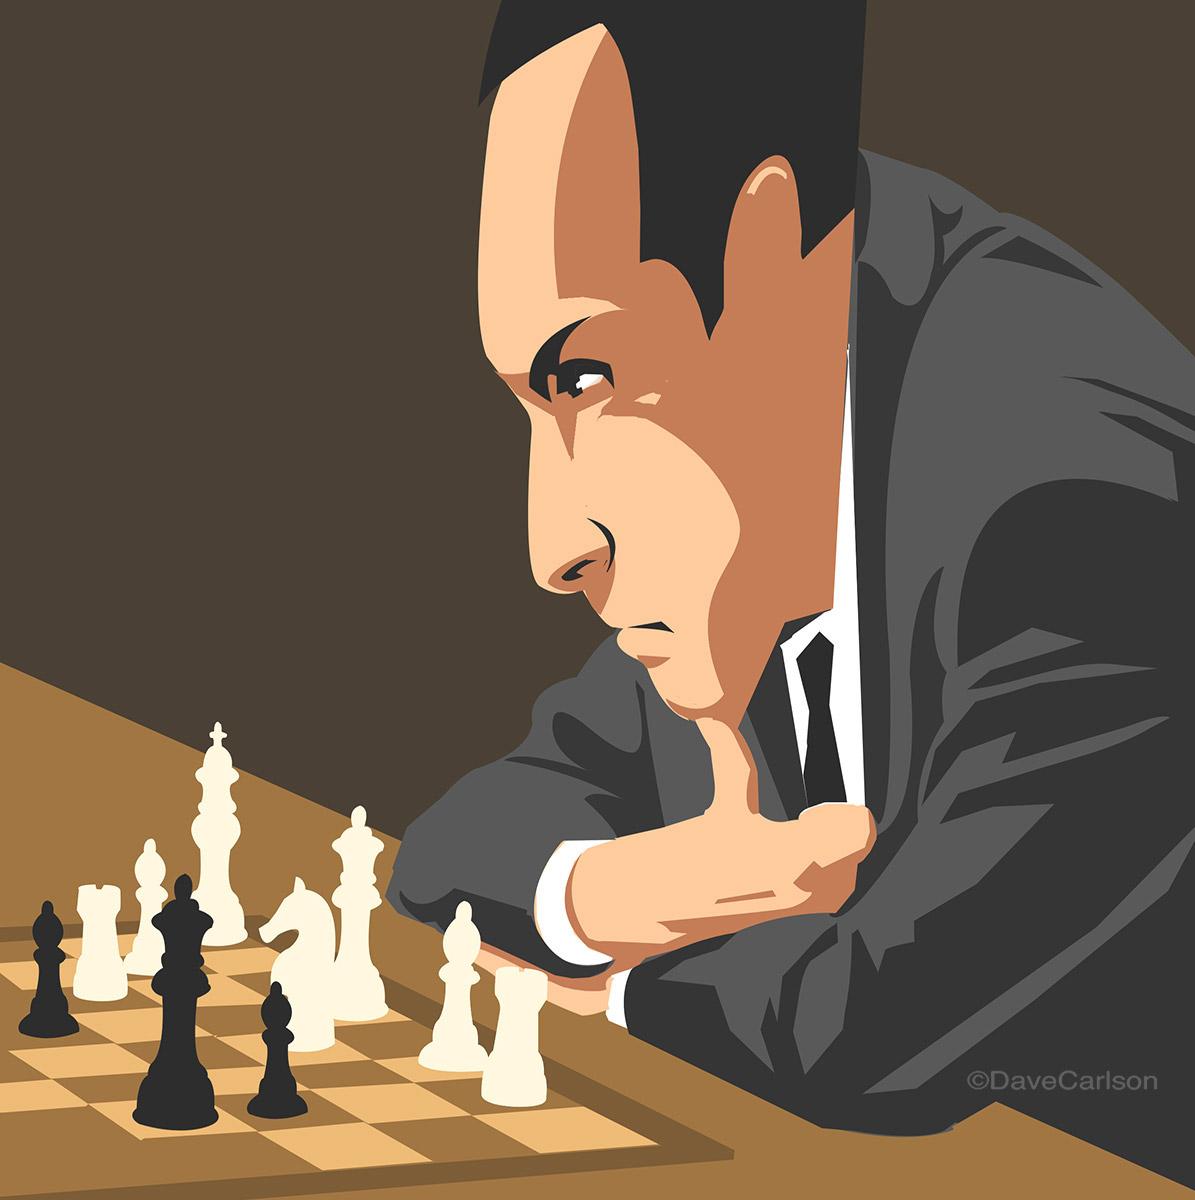 chess player, chess master, chess grand master, tikhail tal, soviet, latvian, photo